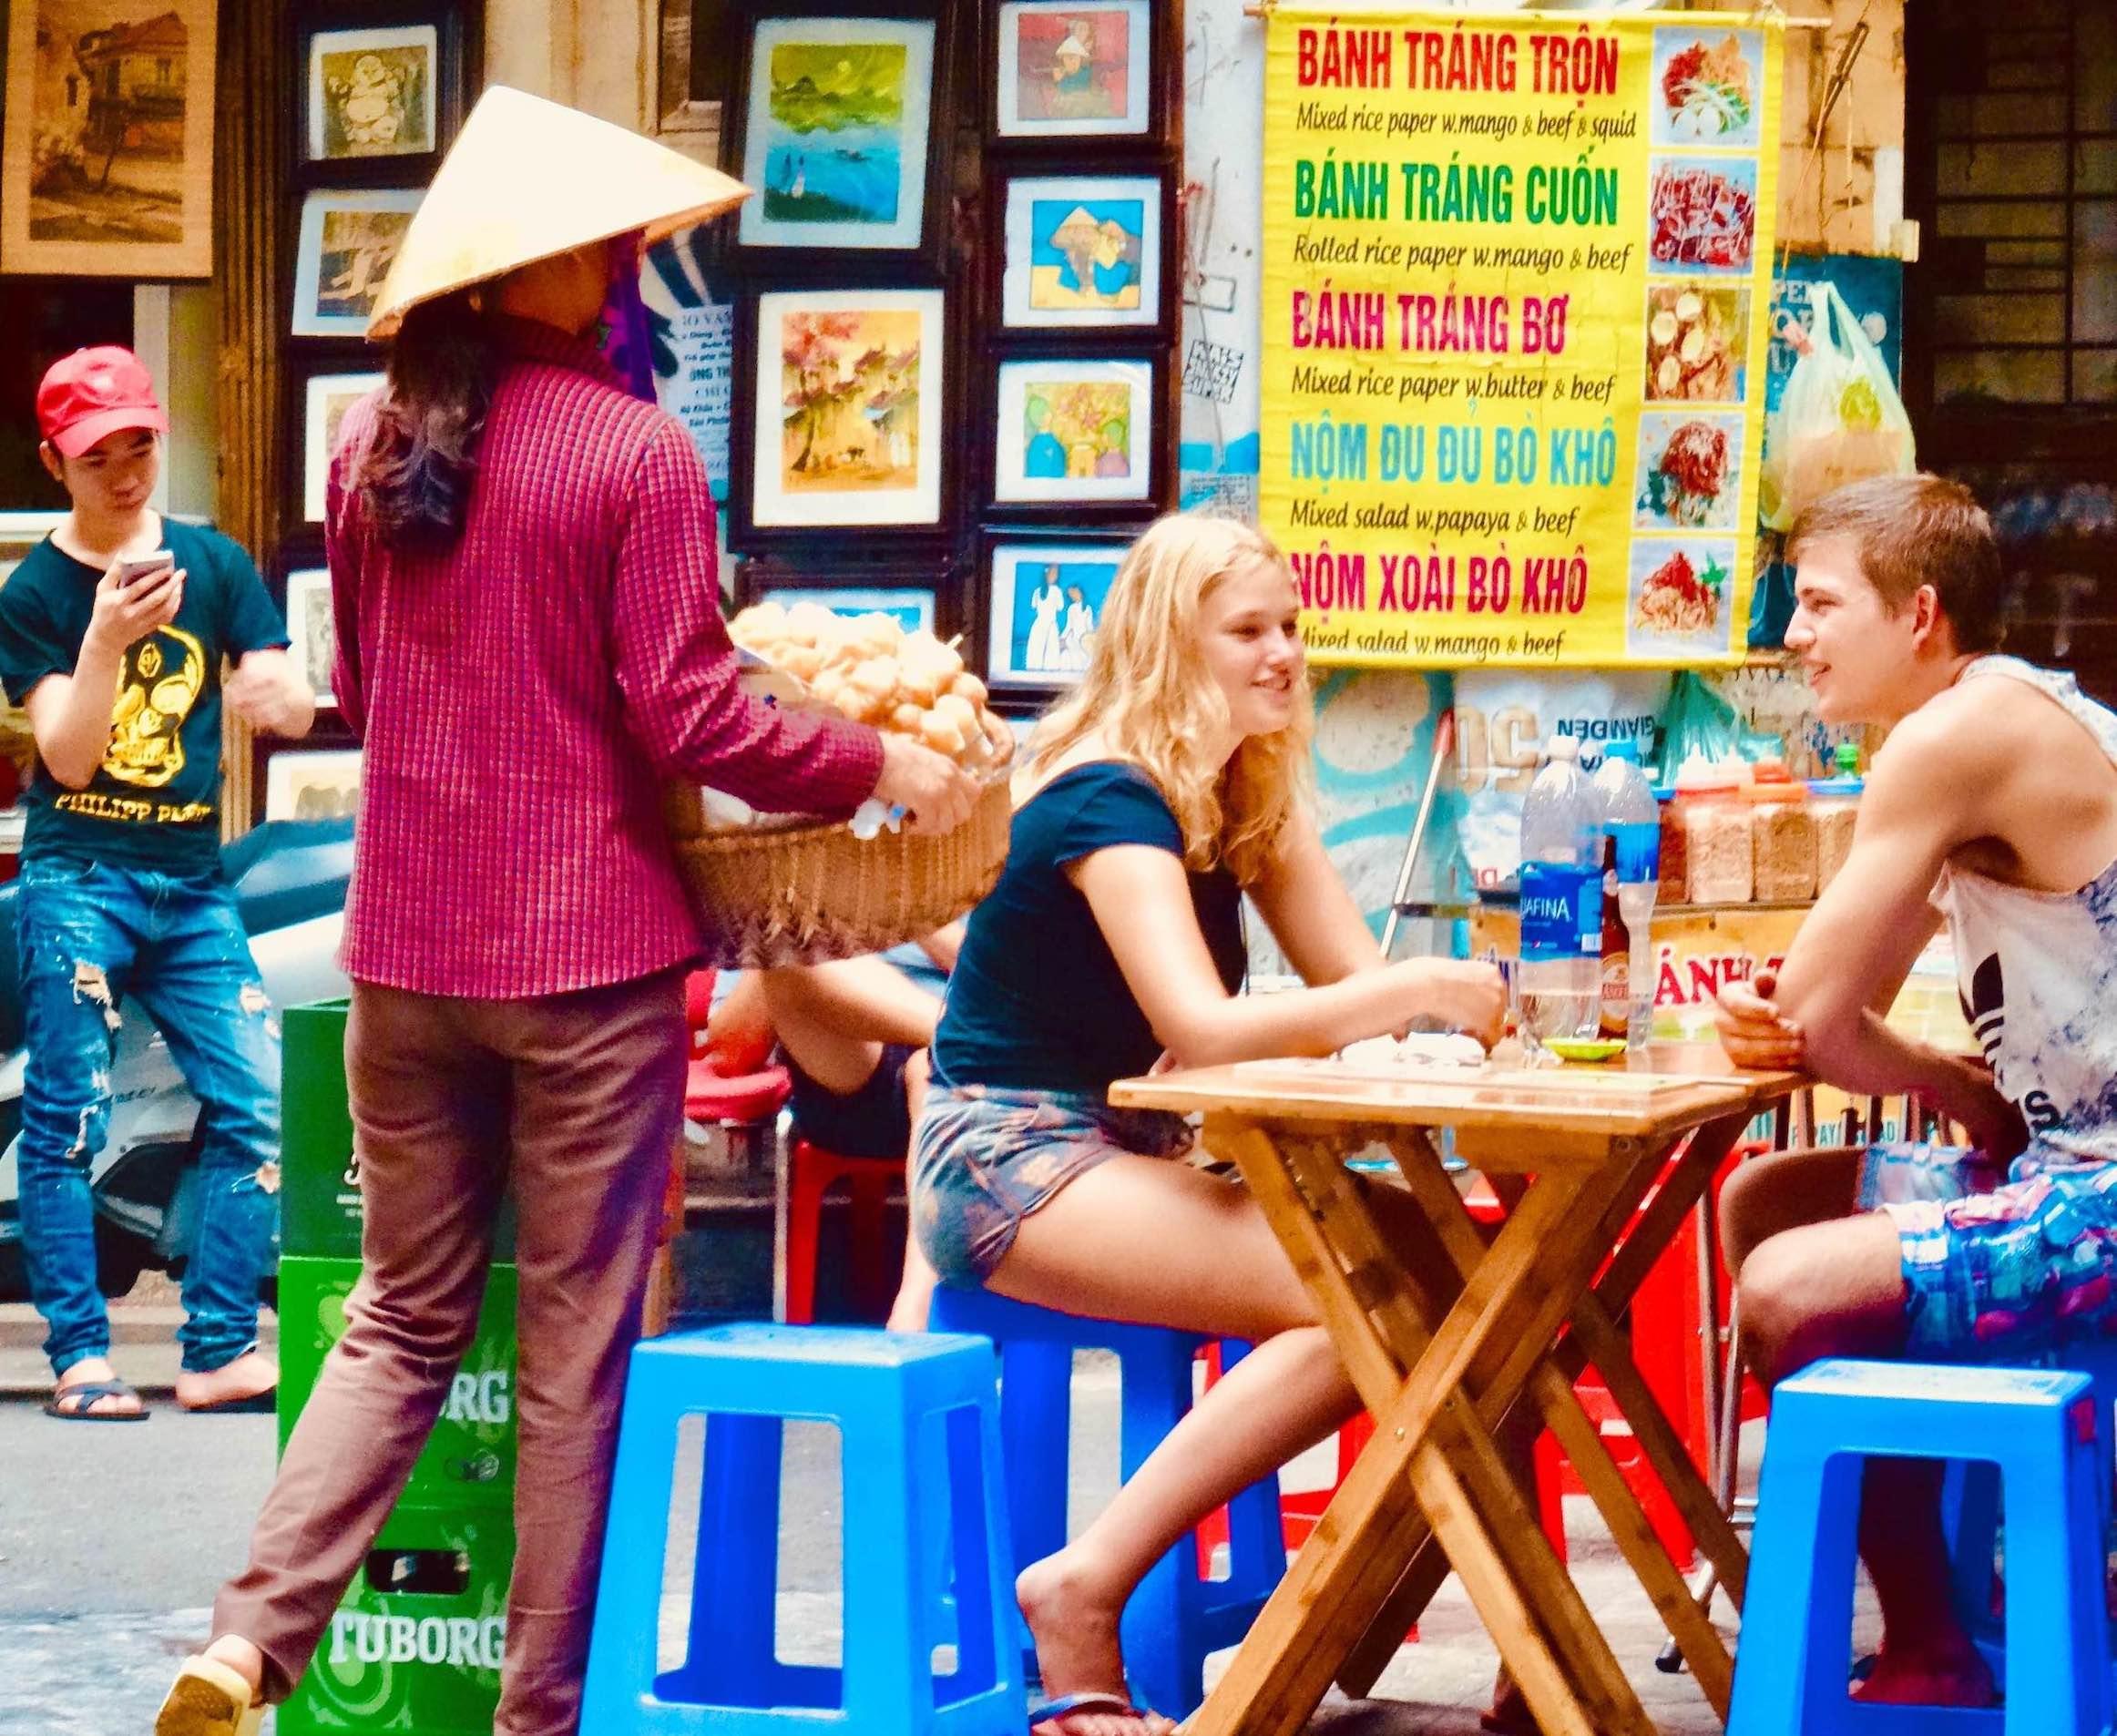 Lunch in the Hanoi Old Quarter Vietnam